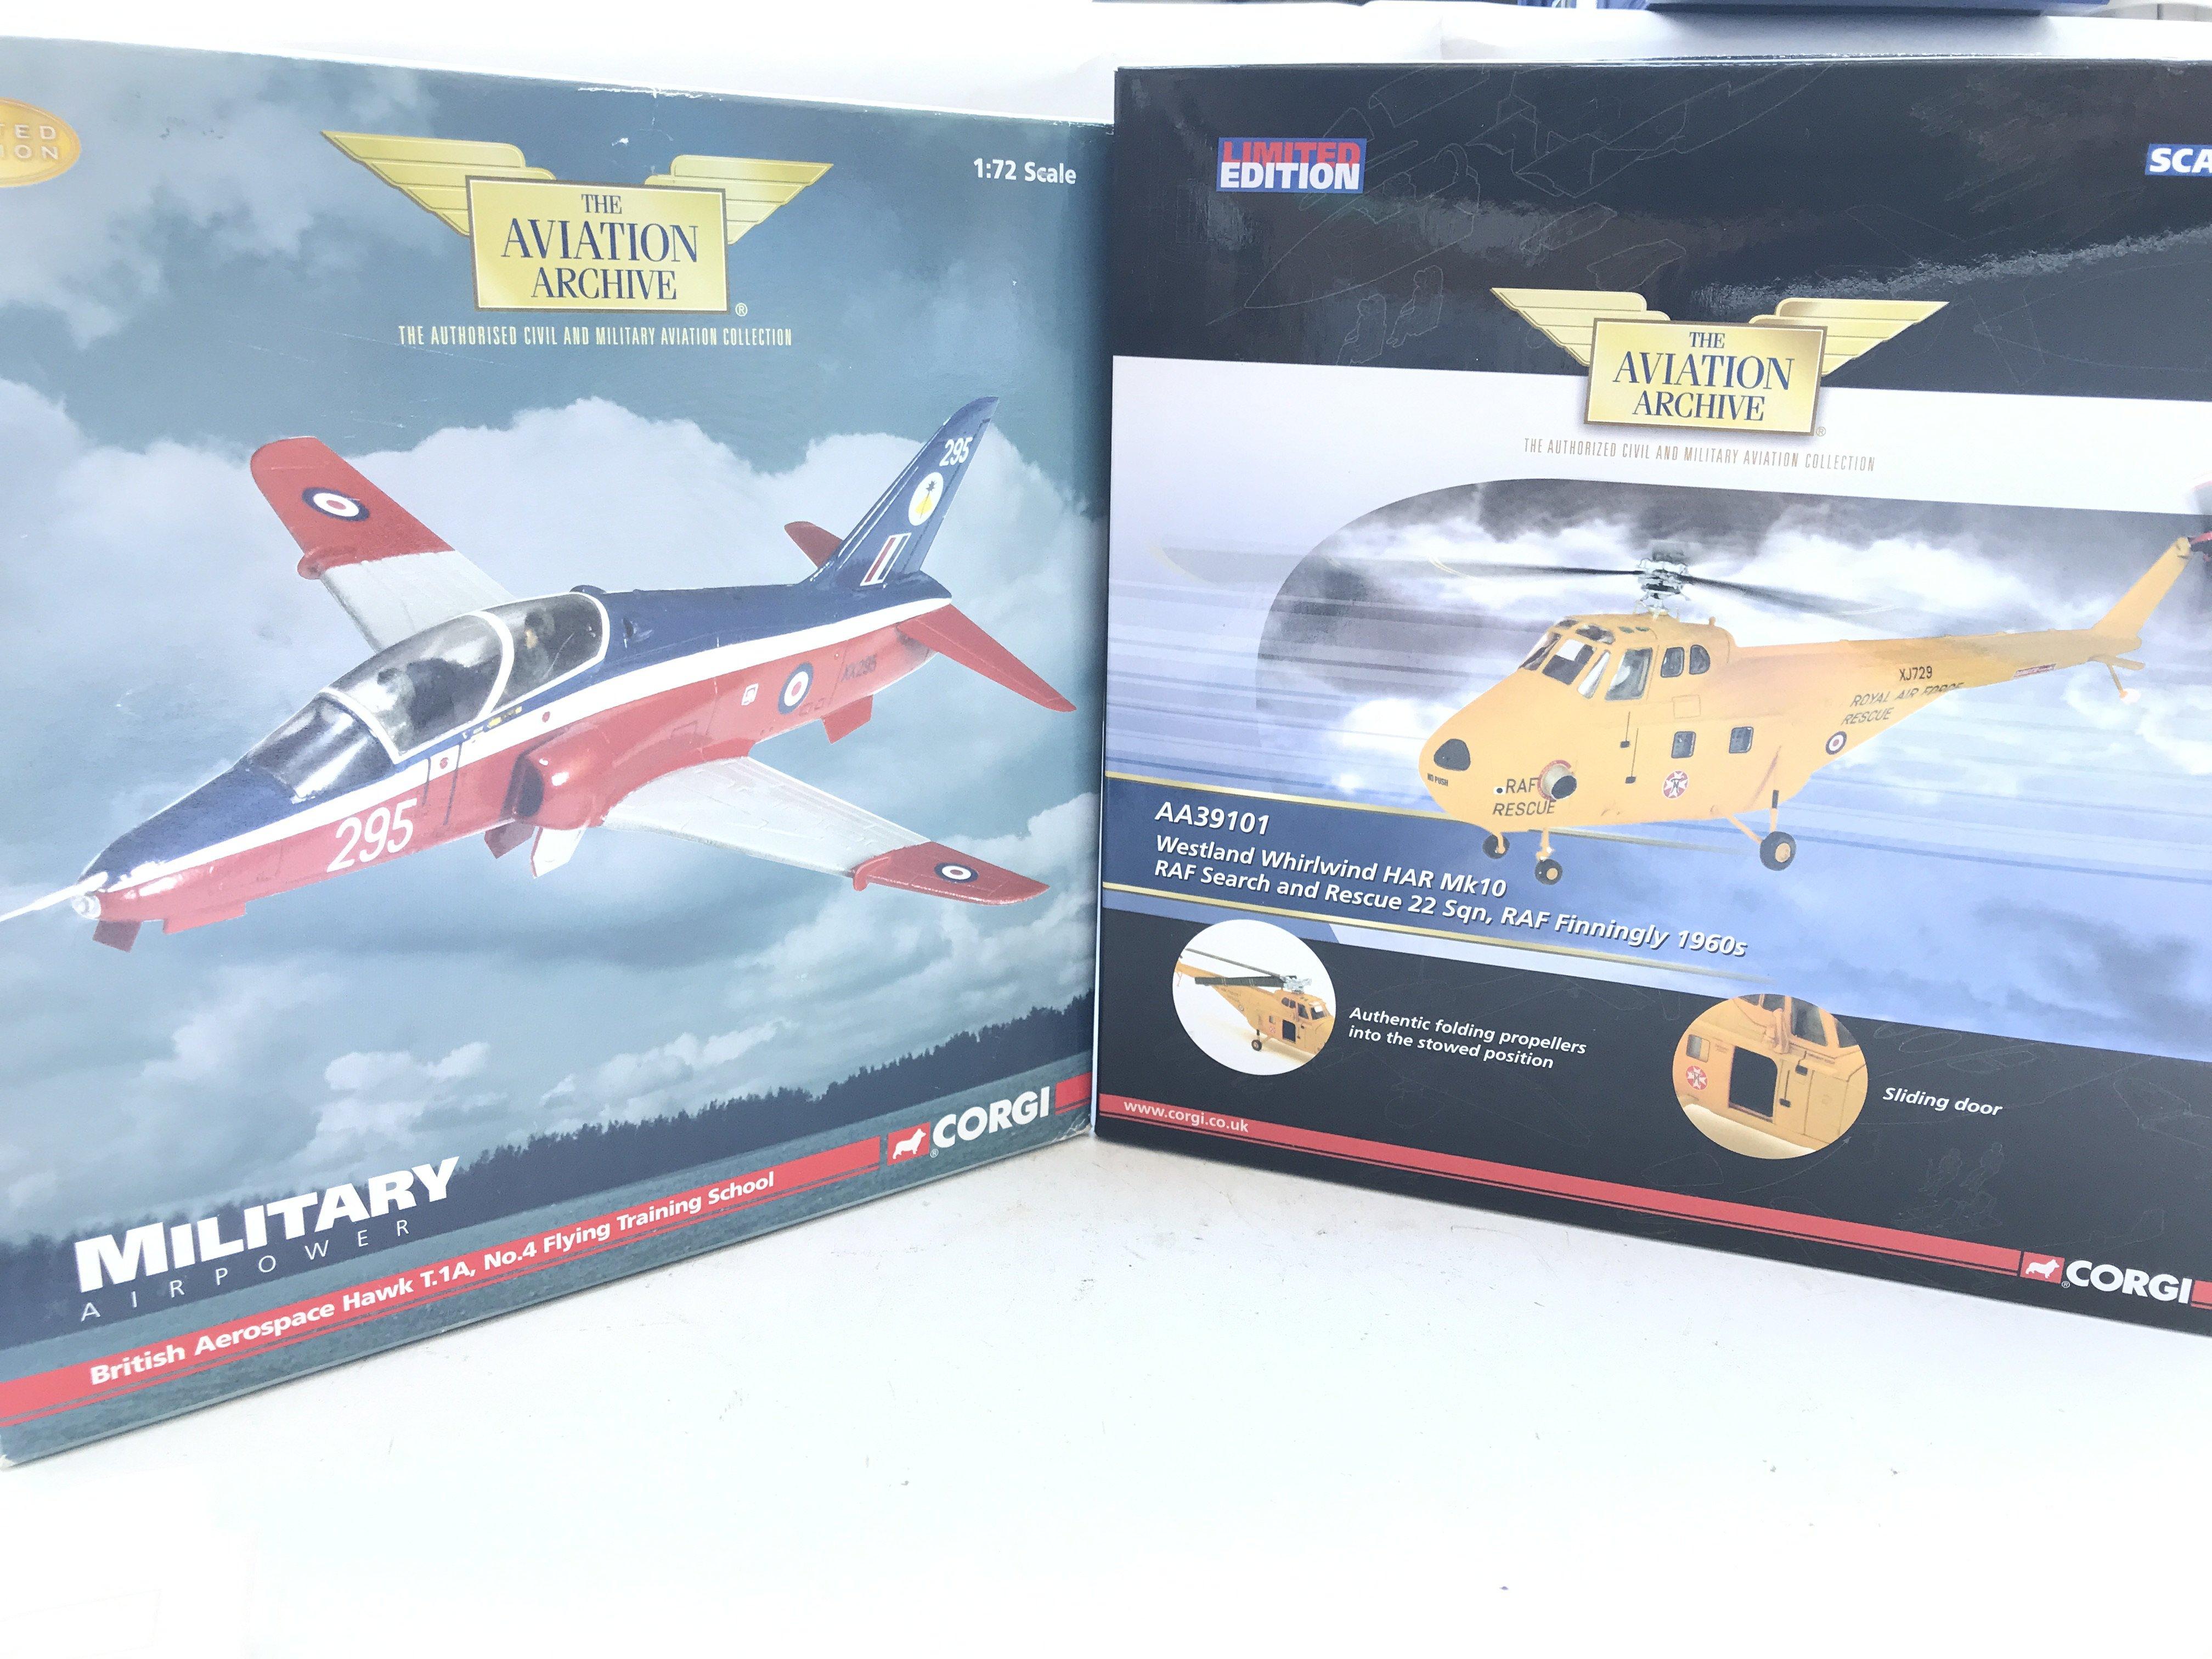 A Boxed Corgi British Areospace Hawk #AA36002 and